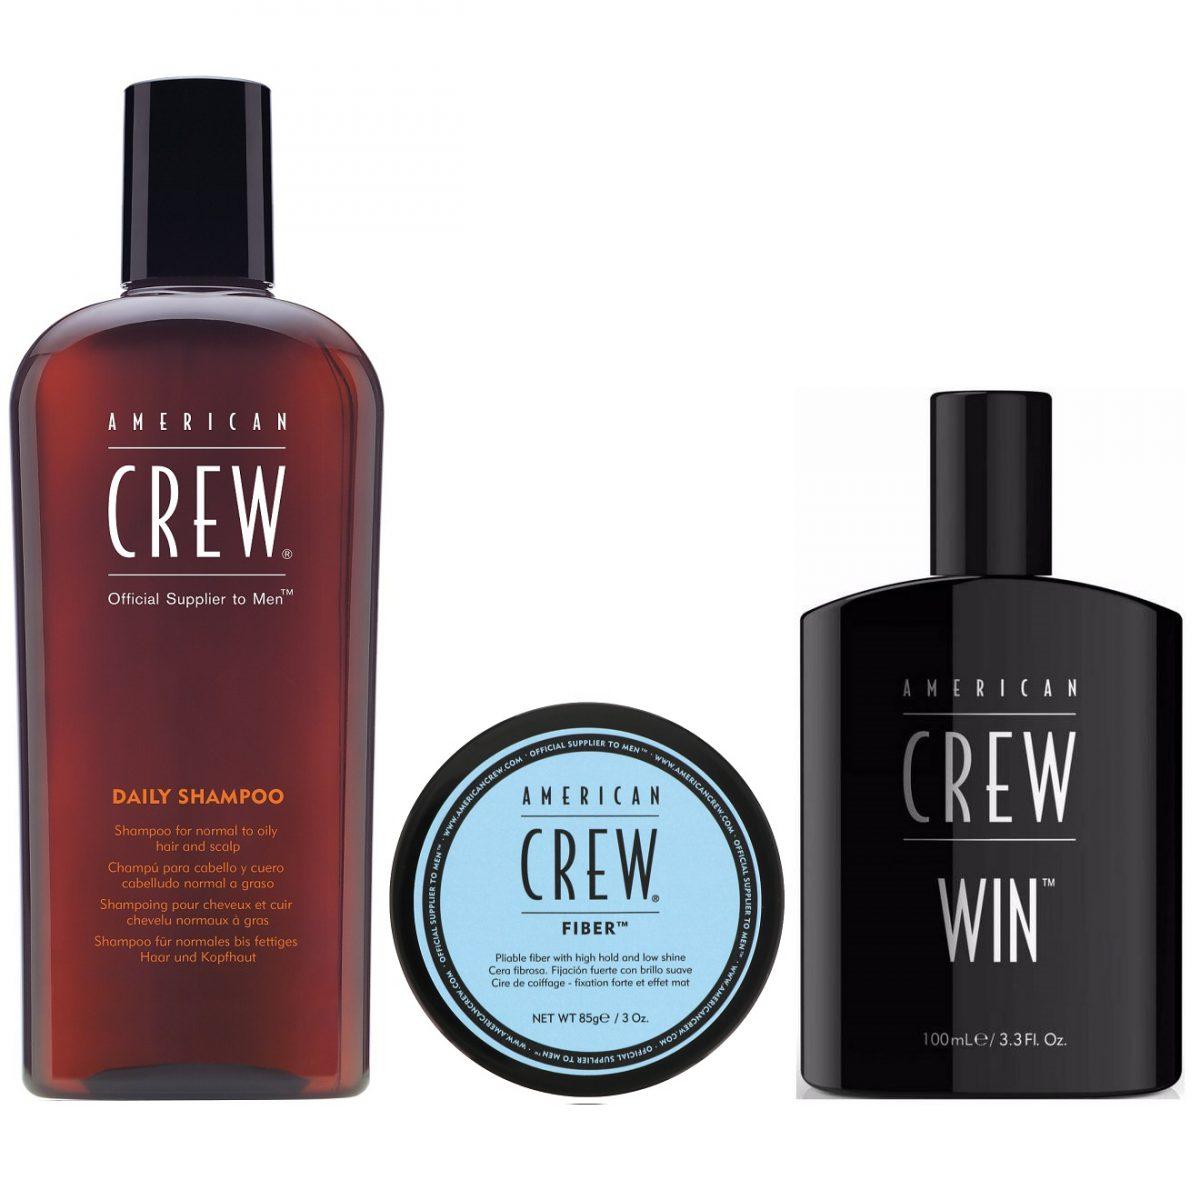 37_American-Crew-Daily-Shampoo-250ml_Fiber_85gr_Win_Fragance_100ml.jpg